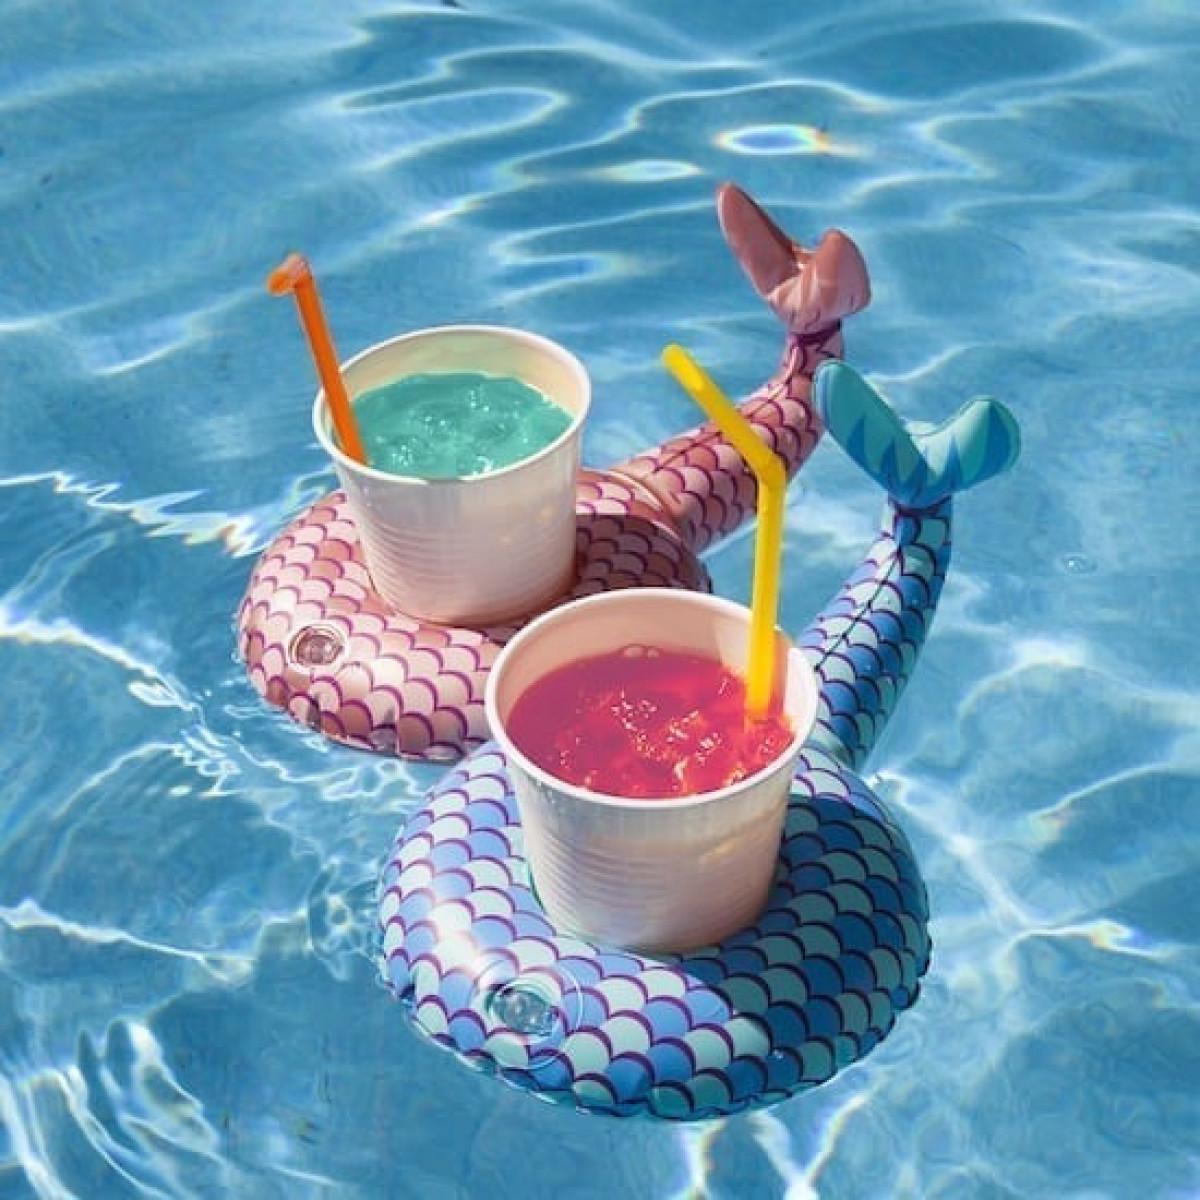 BMDF  Mermaid Tails Bev Boats Lifestyle RGB